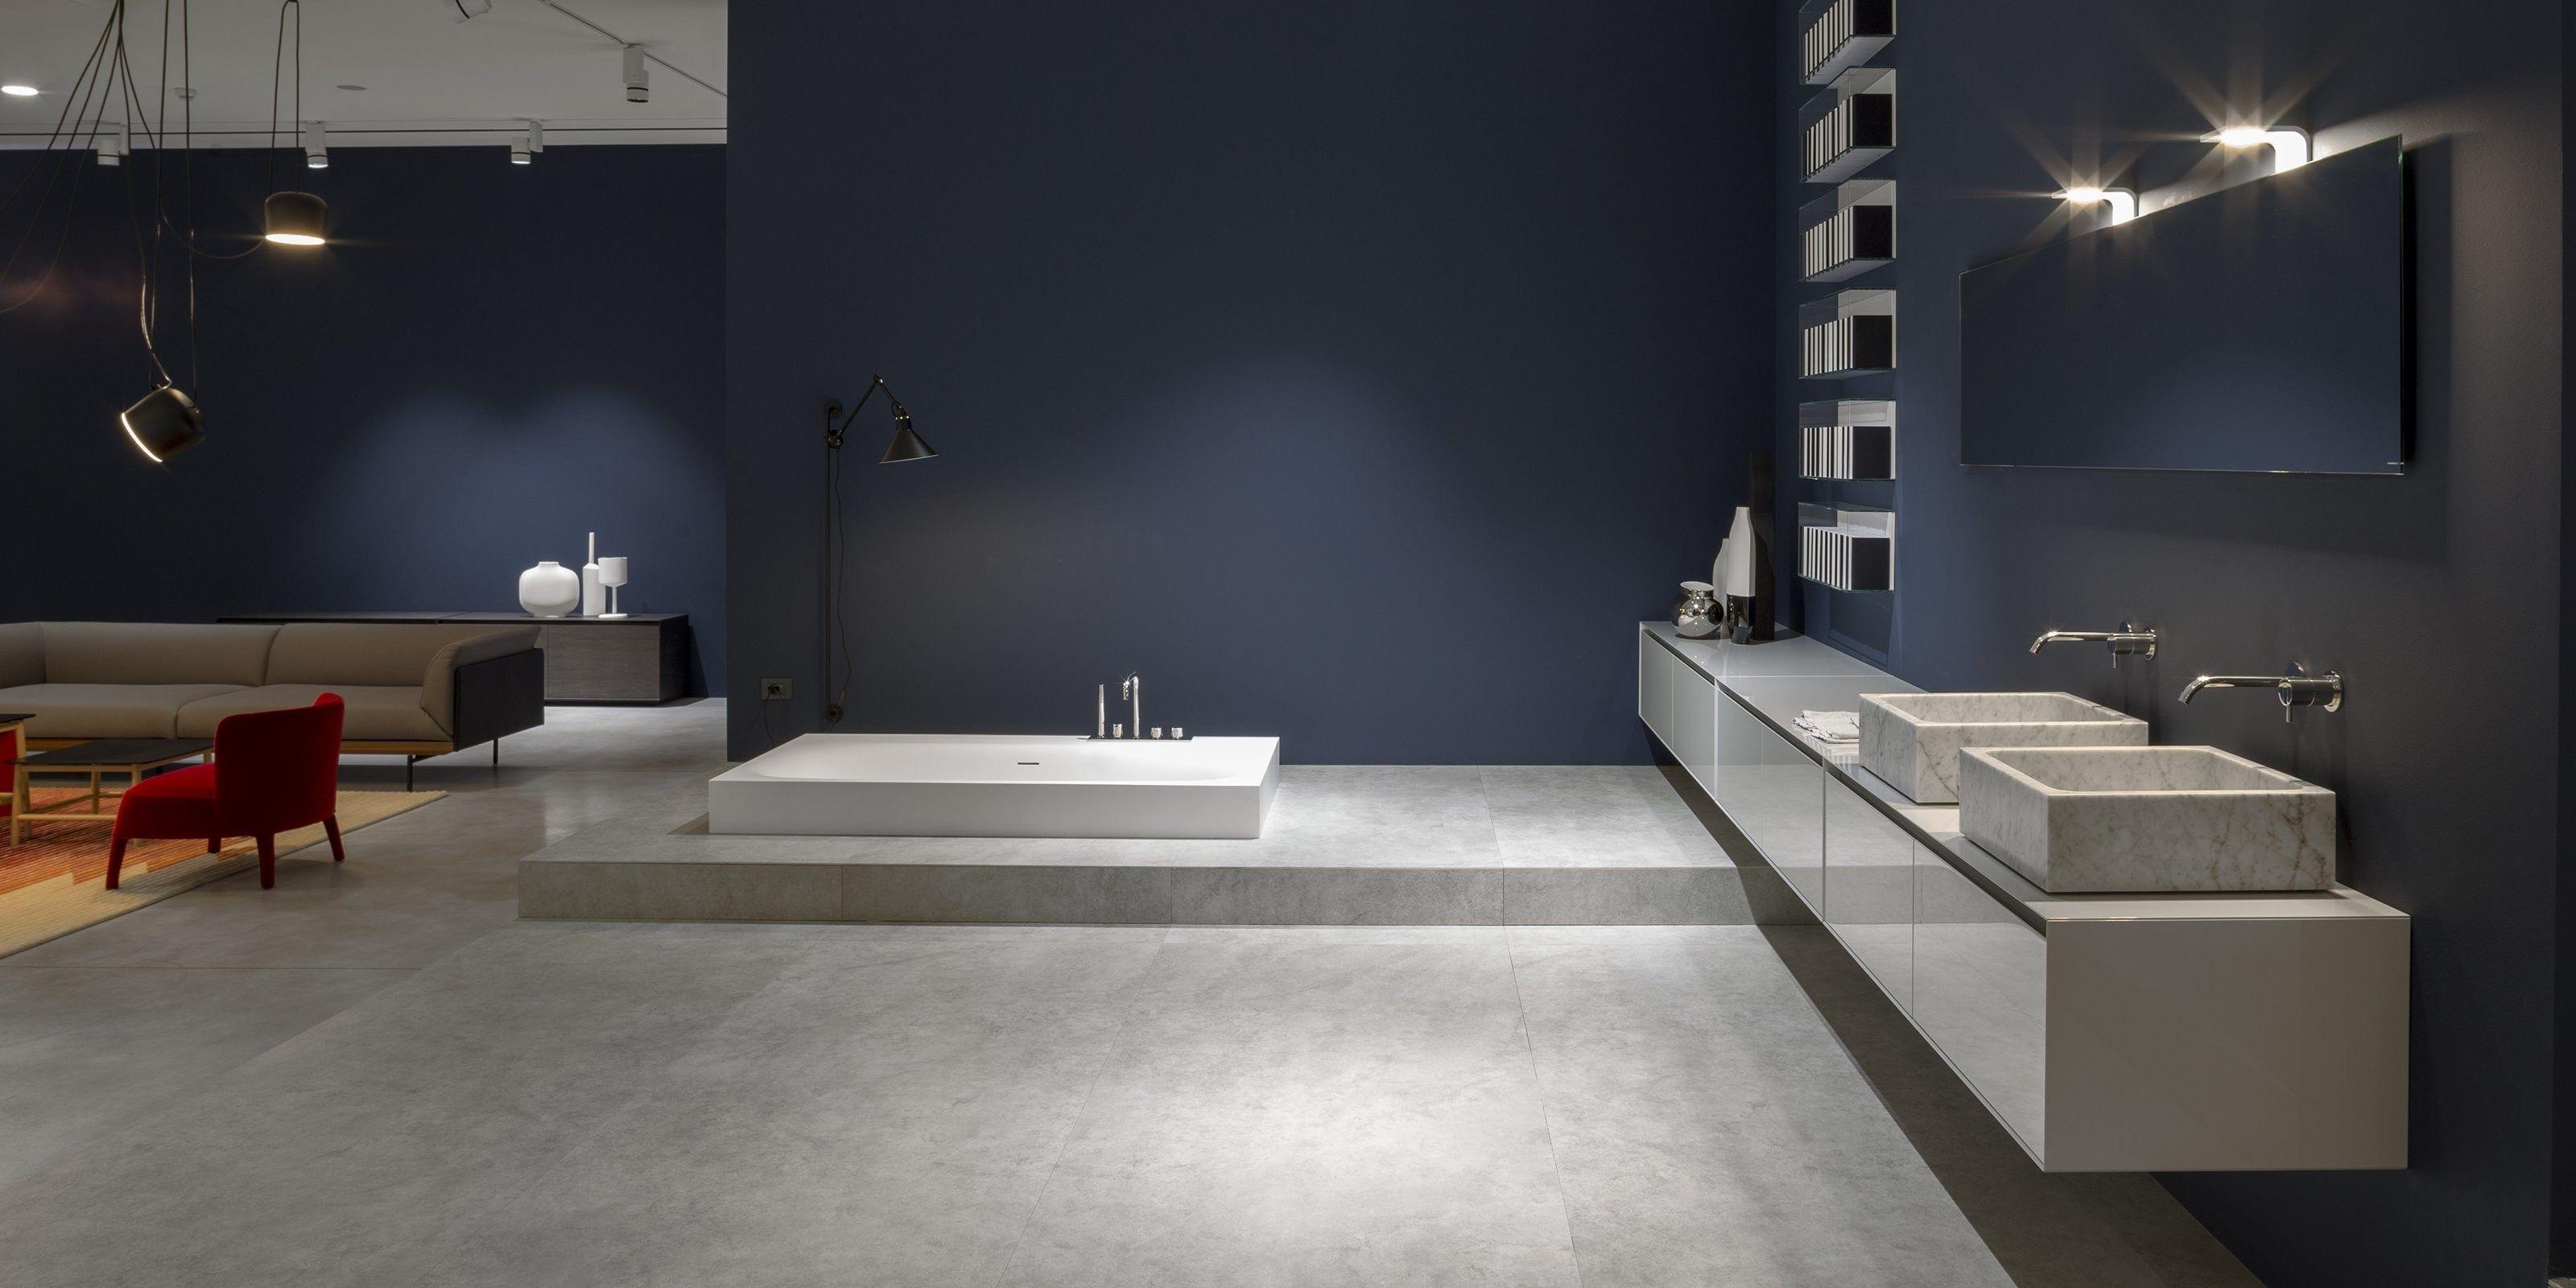 Panta rei by antonio lupi design for Badezimmer ausstattung